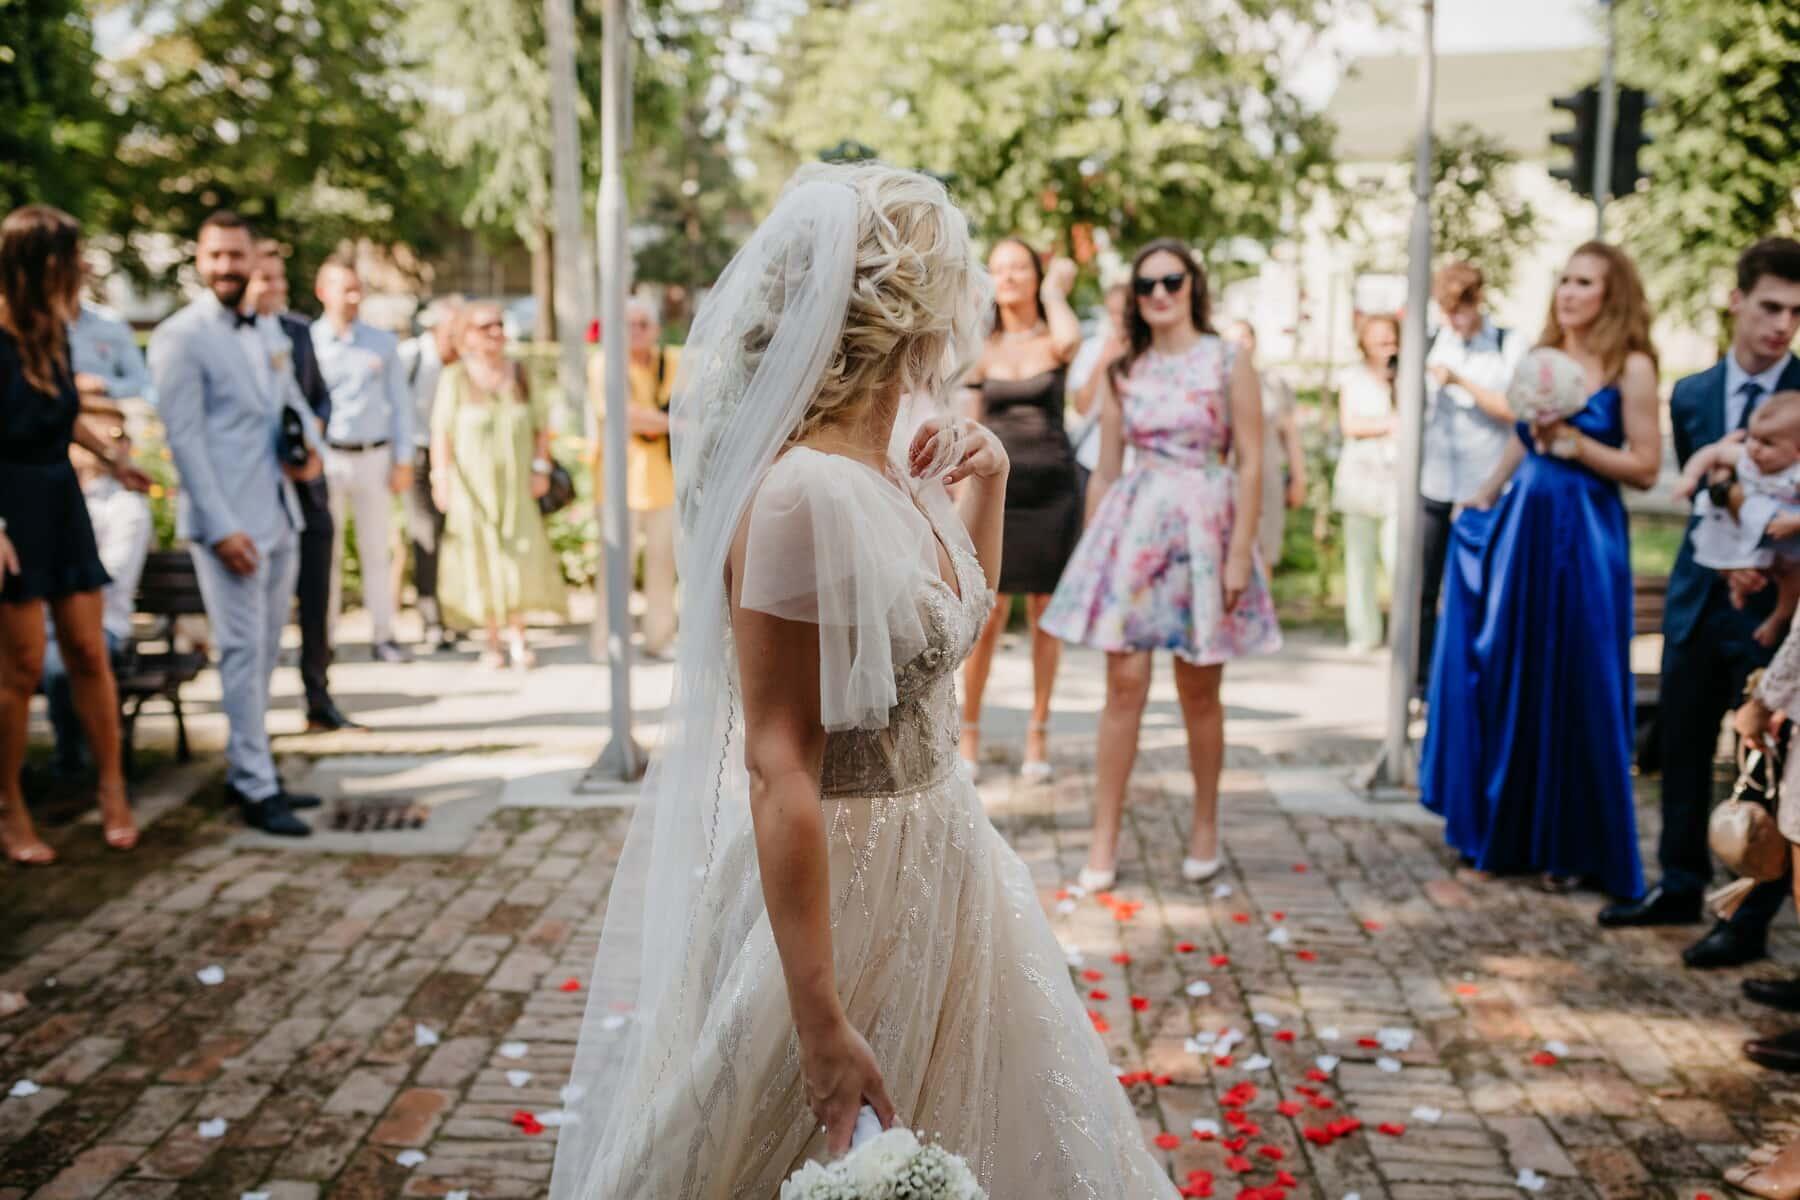 crowd, girlfriend, bride, ceremony, friends, wedding, people, woman, outdoors, dress